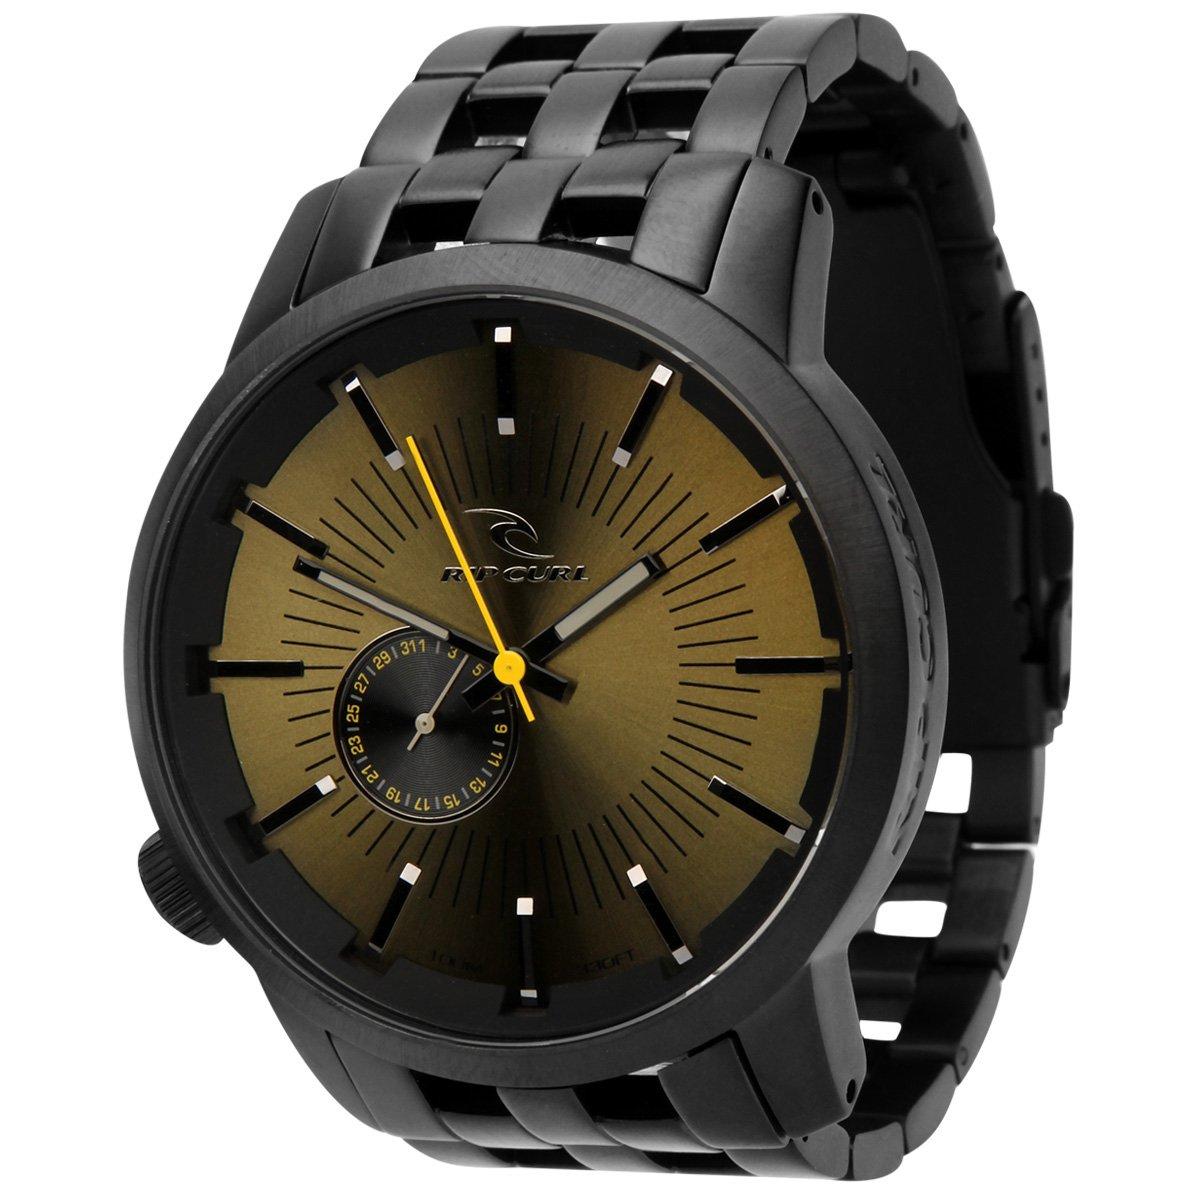 ed7185a55c6 Relógio Rip Curl Detroit - Compre Agora